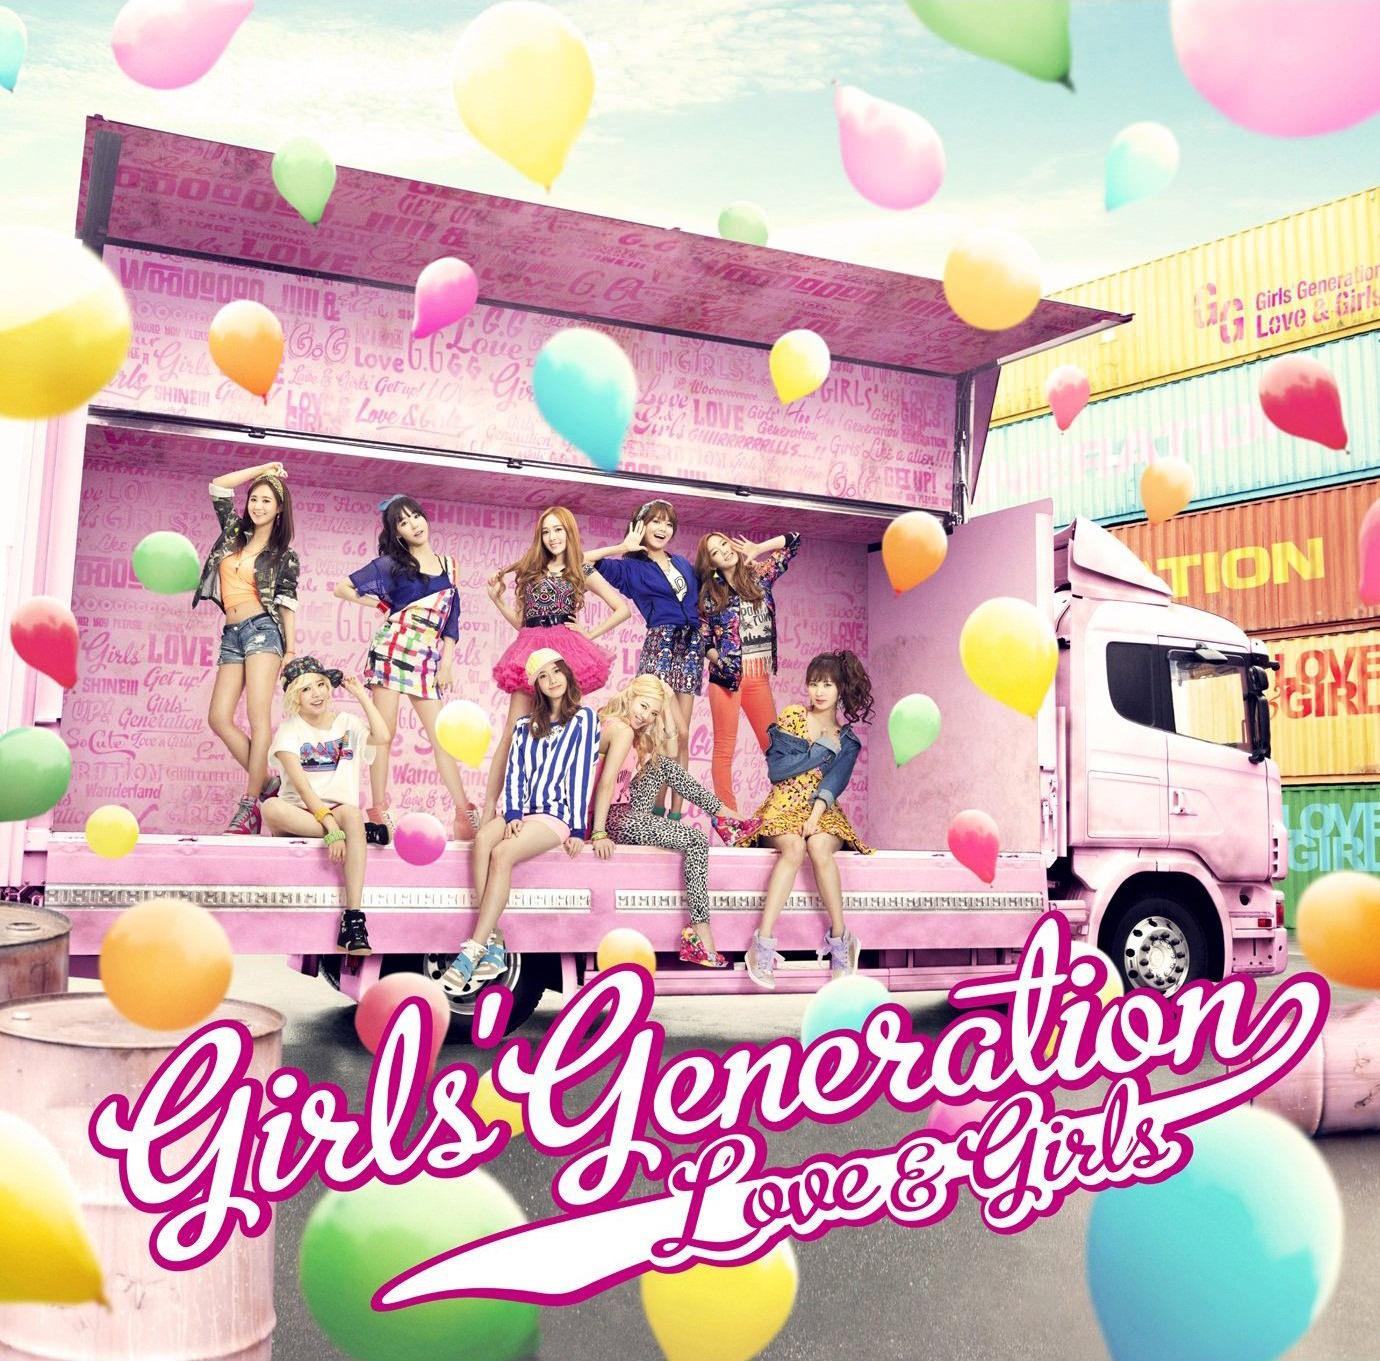 Snsd Candy Box Love Girls 超高画質画像 壁紙 サイト紹介 少女時代